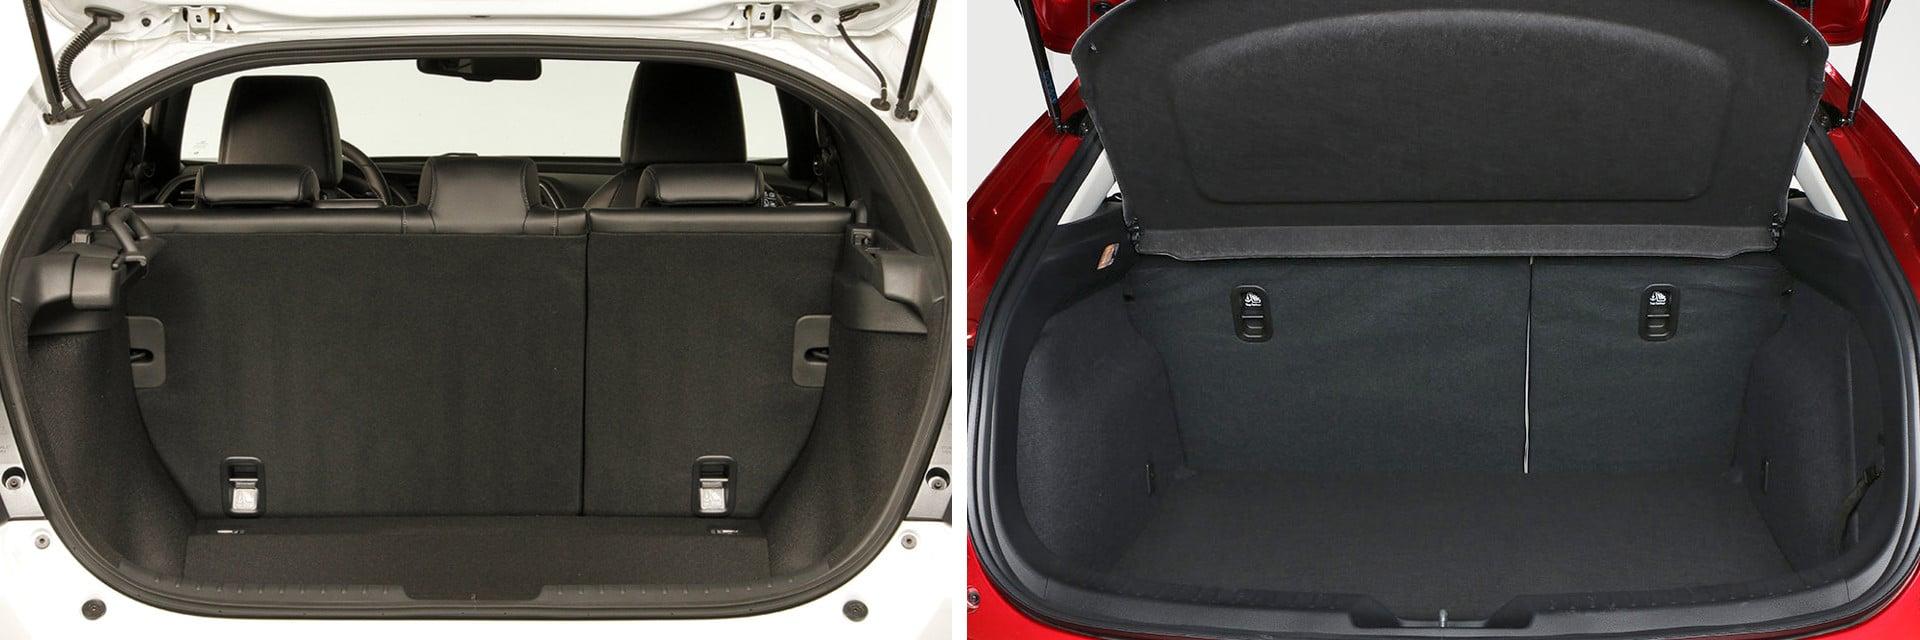 El volumen del maletero del Civic (izq.) es muy superior al del Mazda3 (dcha.): 478 litros del Honda por los 364 del Mazda.